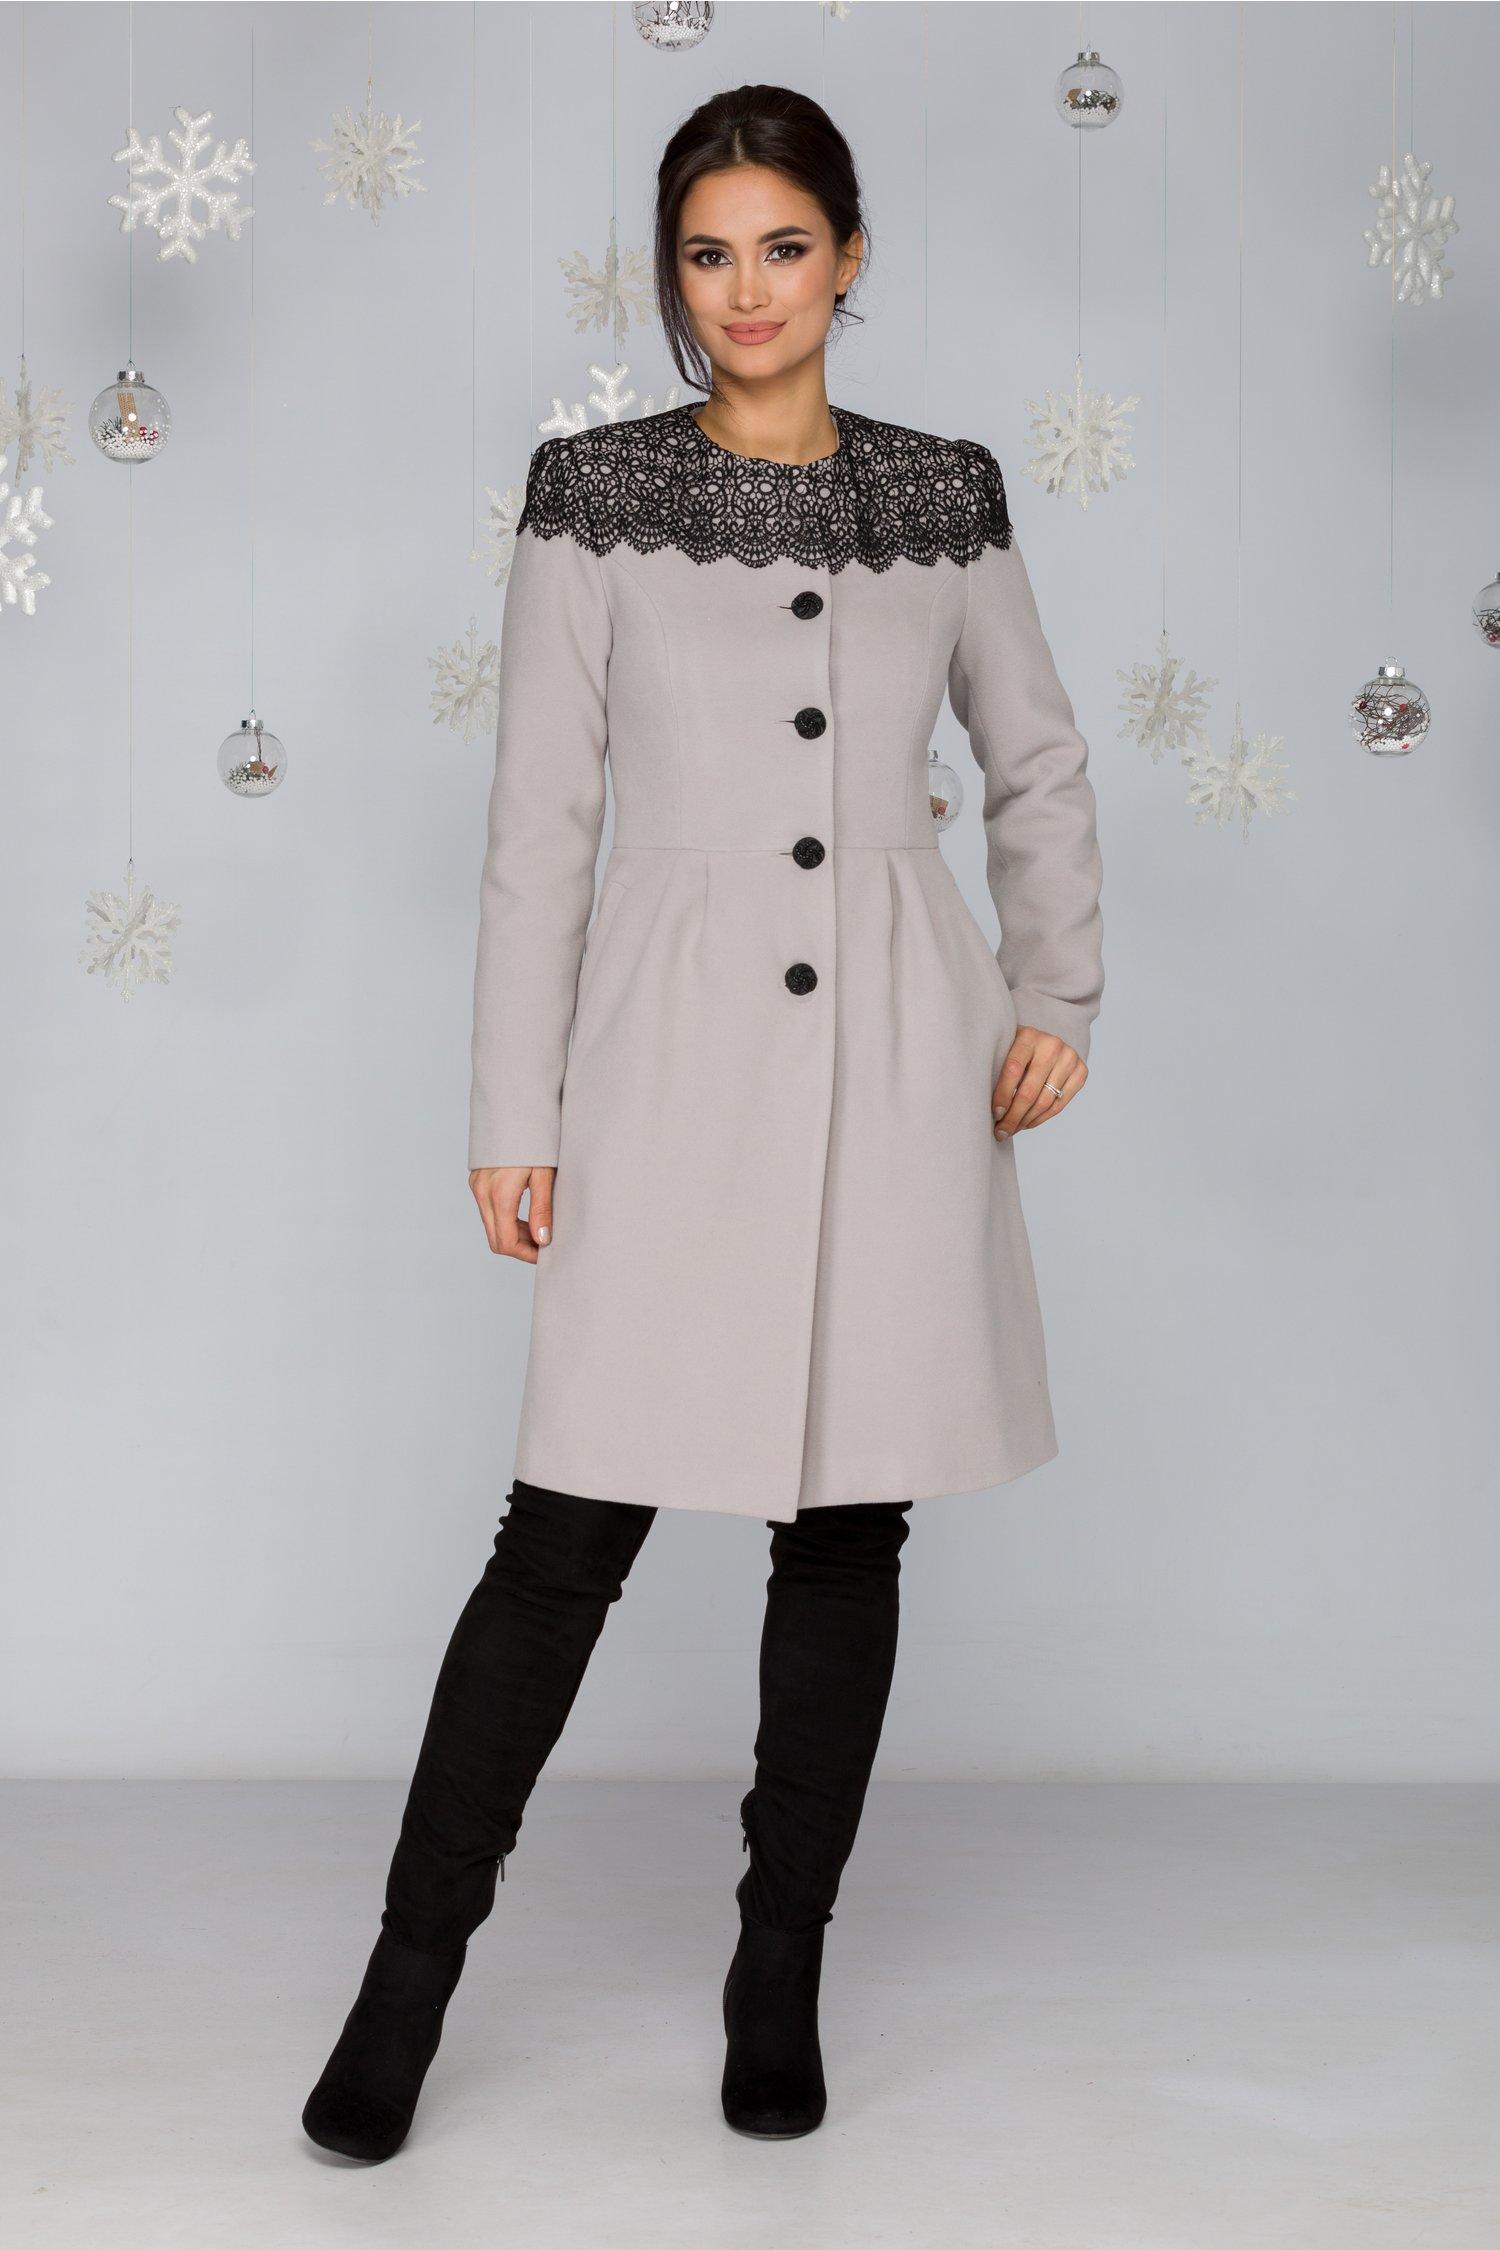 Palton LaDonna gri in croi clos cu broderie neagra handmade